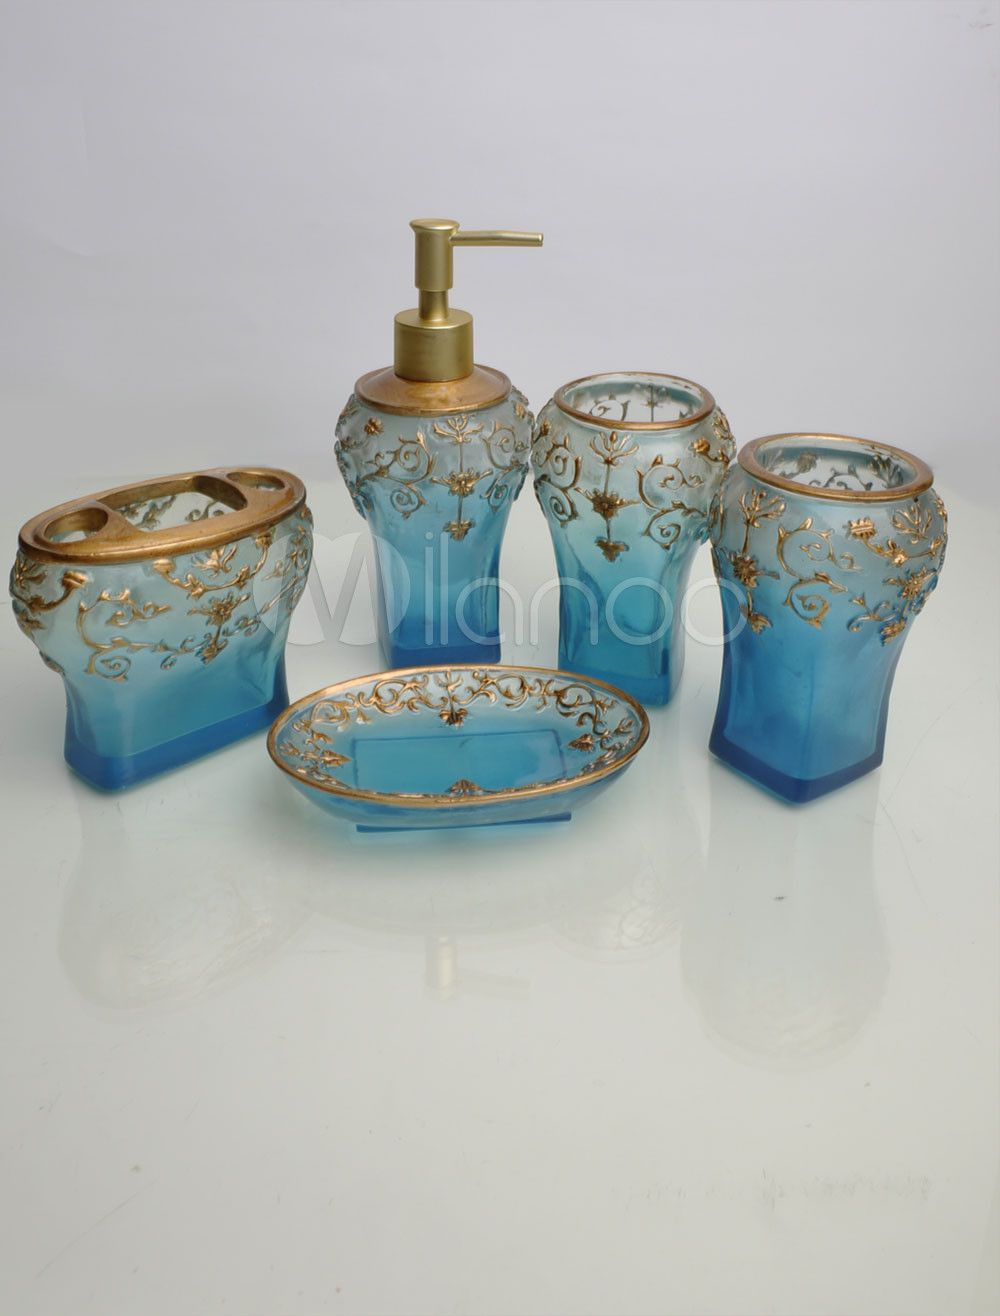 Bathroom sets on pinterest for Blue bath accessories set